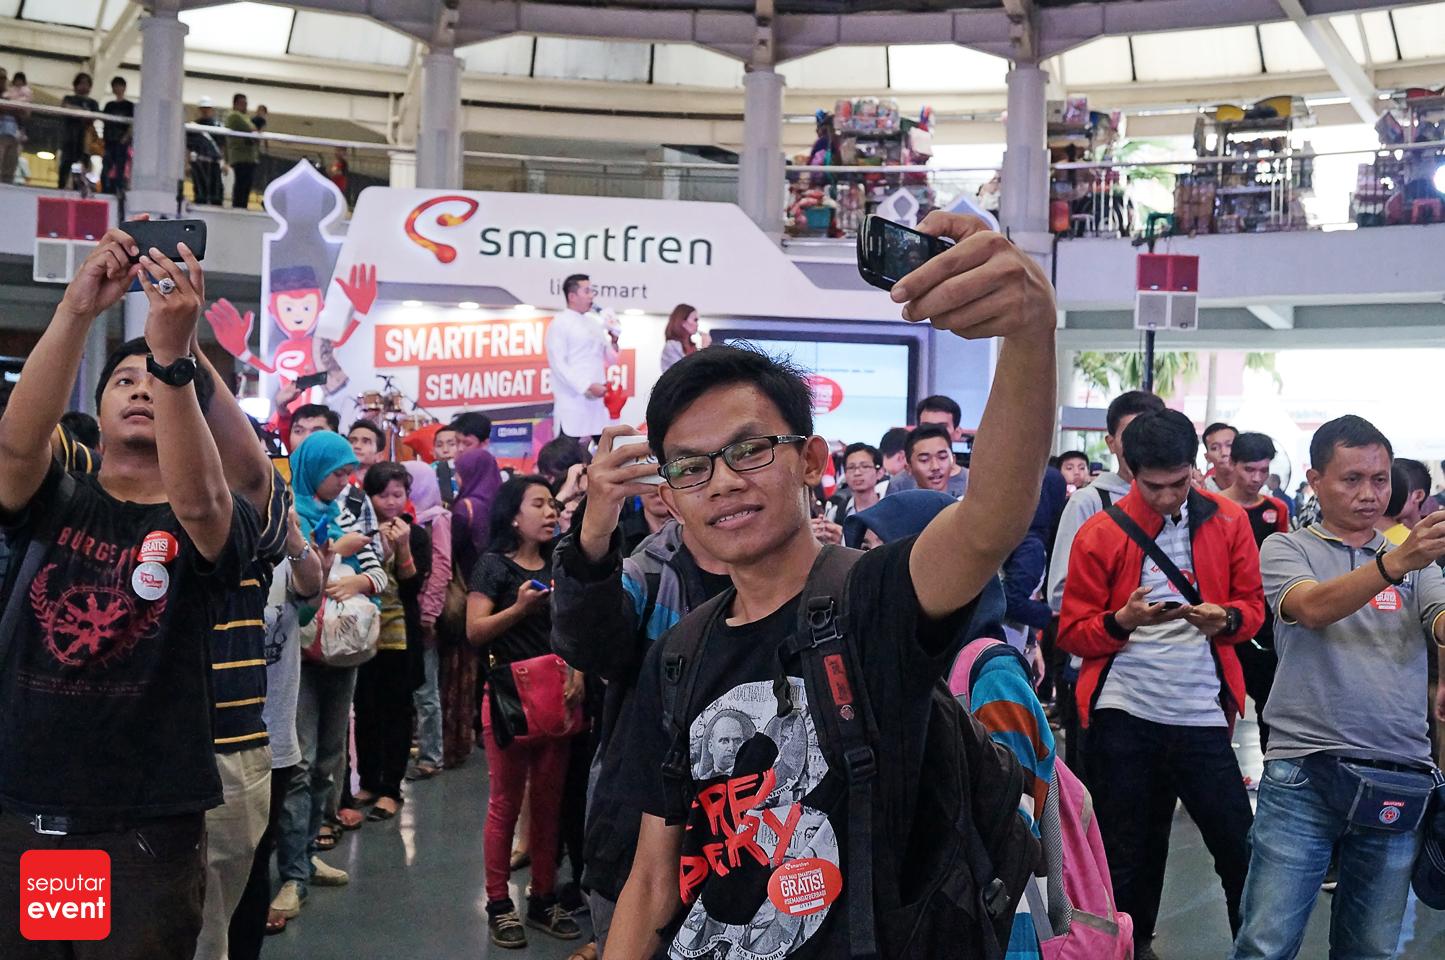 smartfren-semangat-berbagi-2014__ (25).JPG